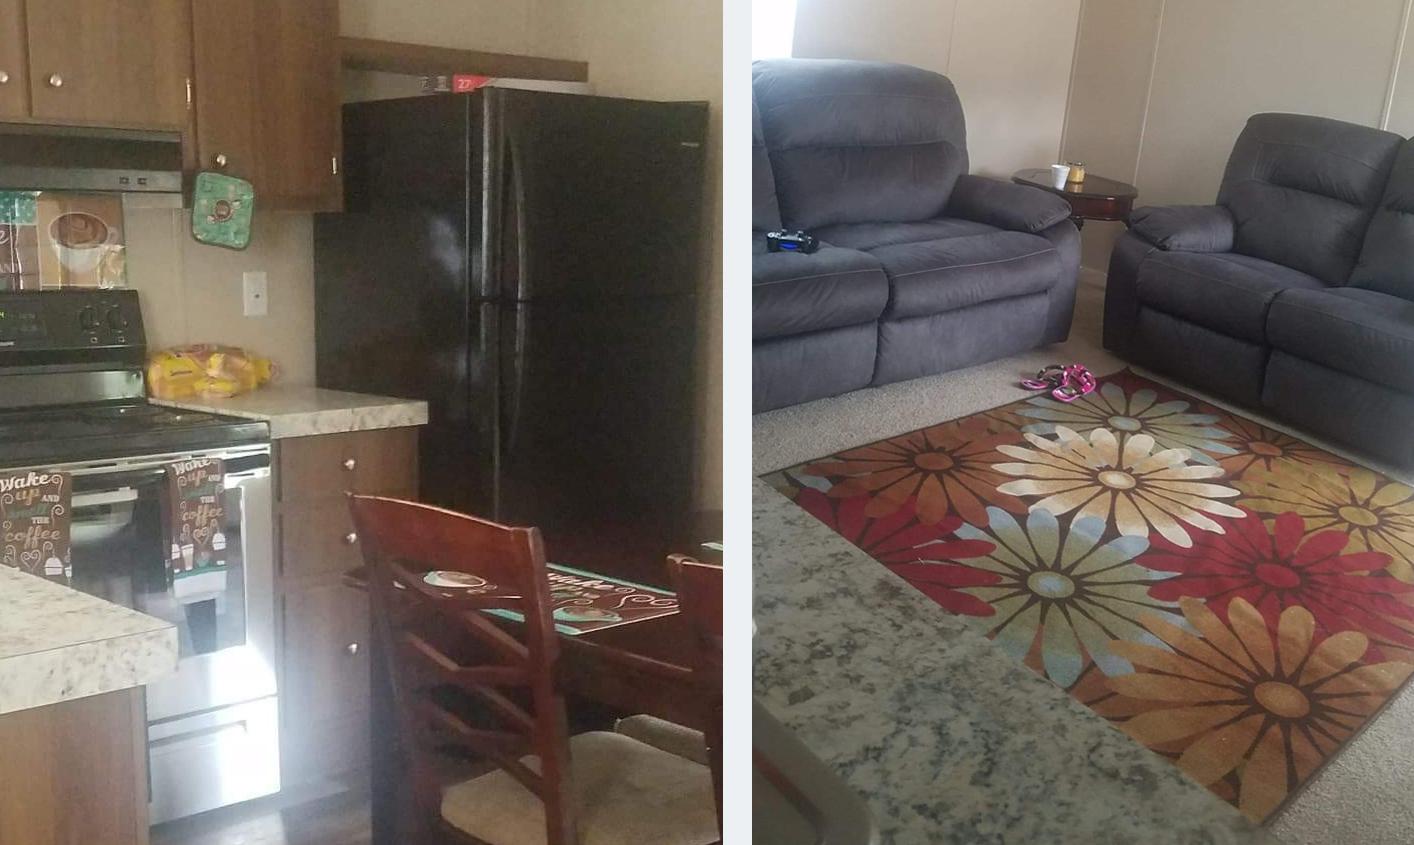 Latoi Jones' kitchen and living room